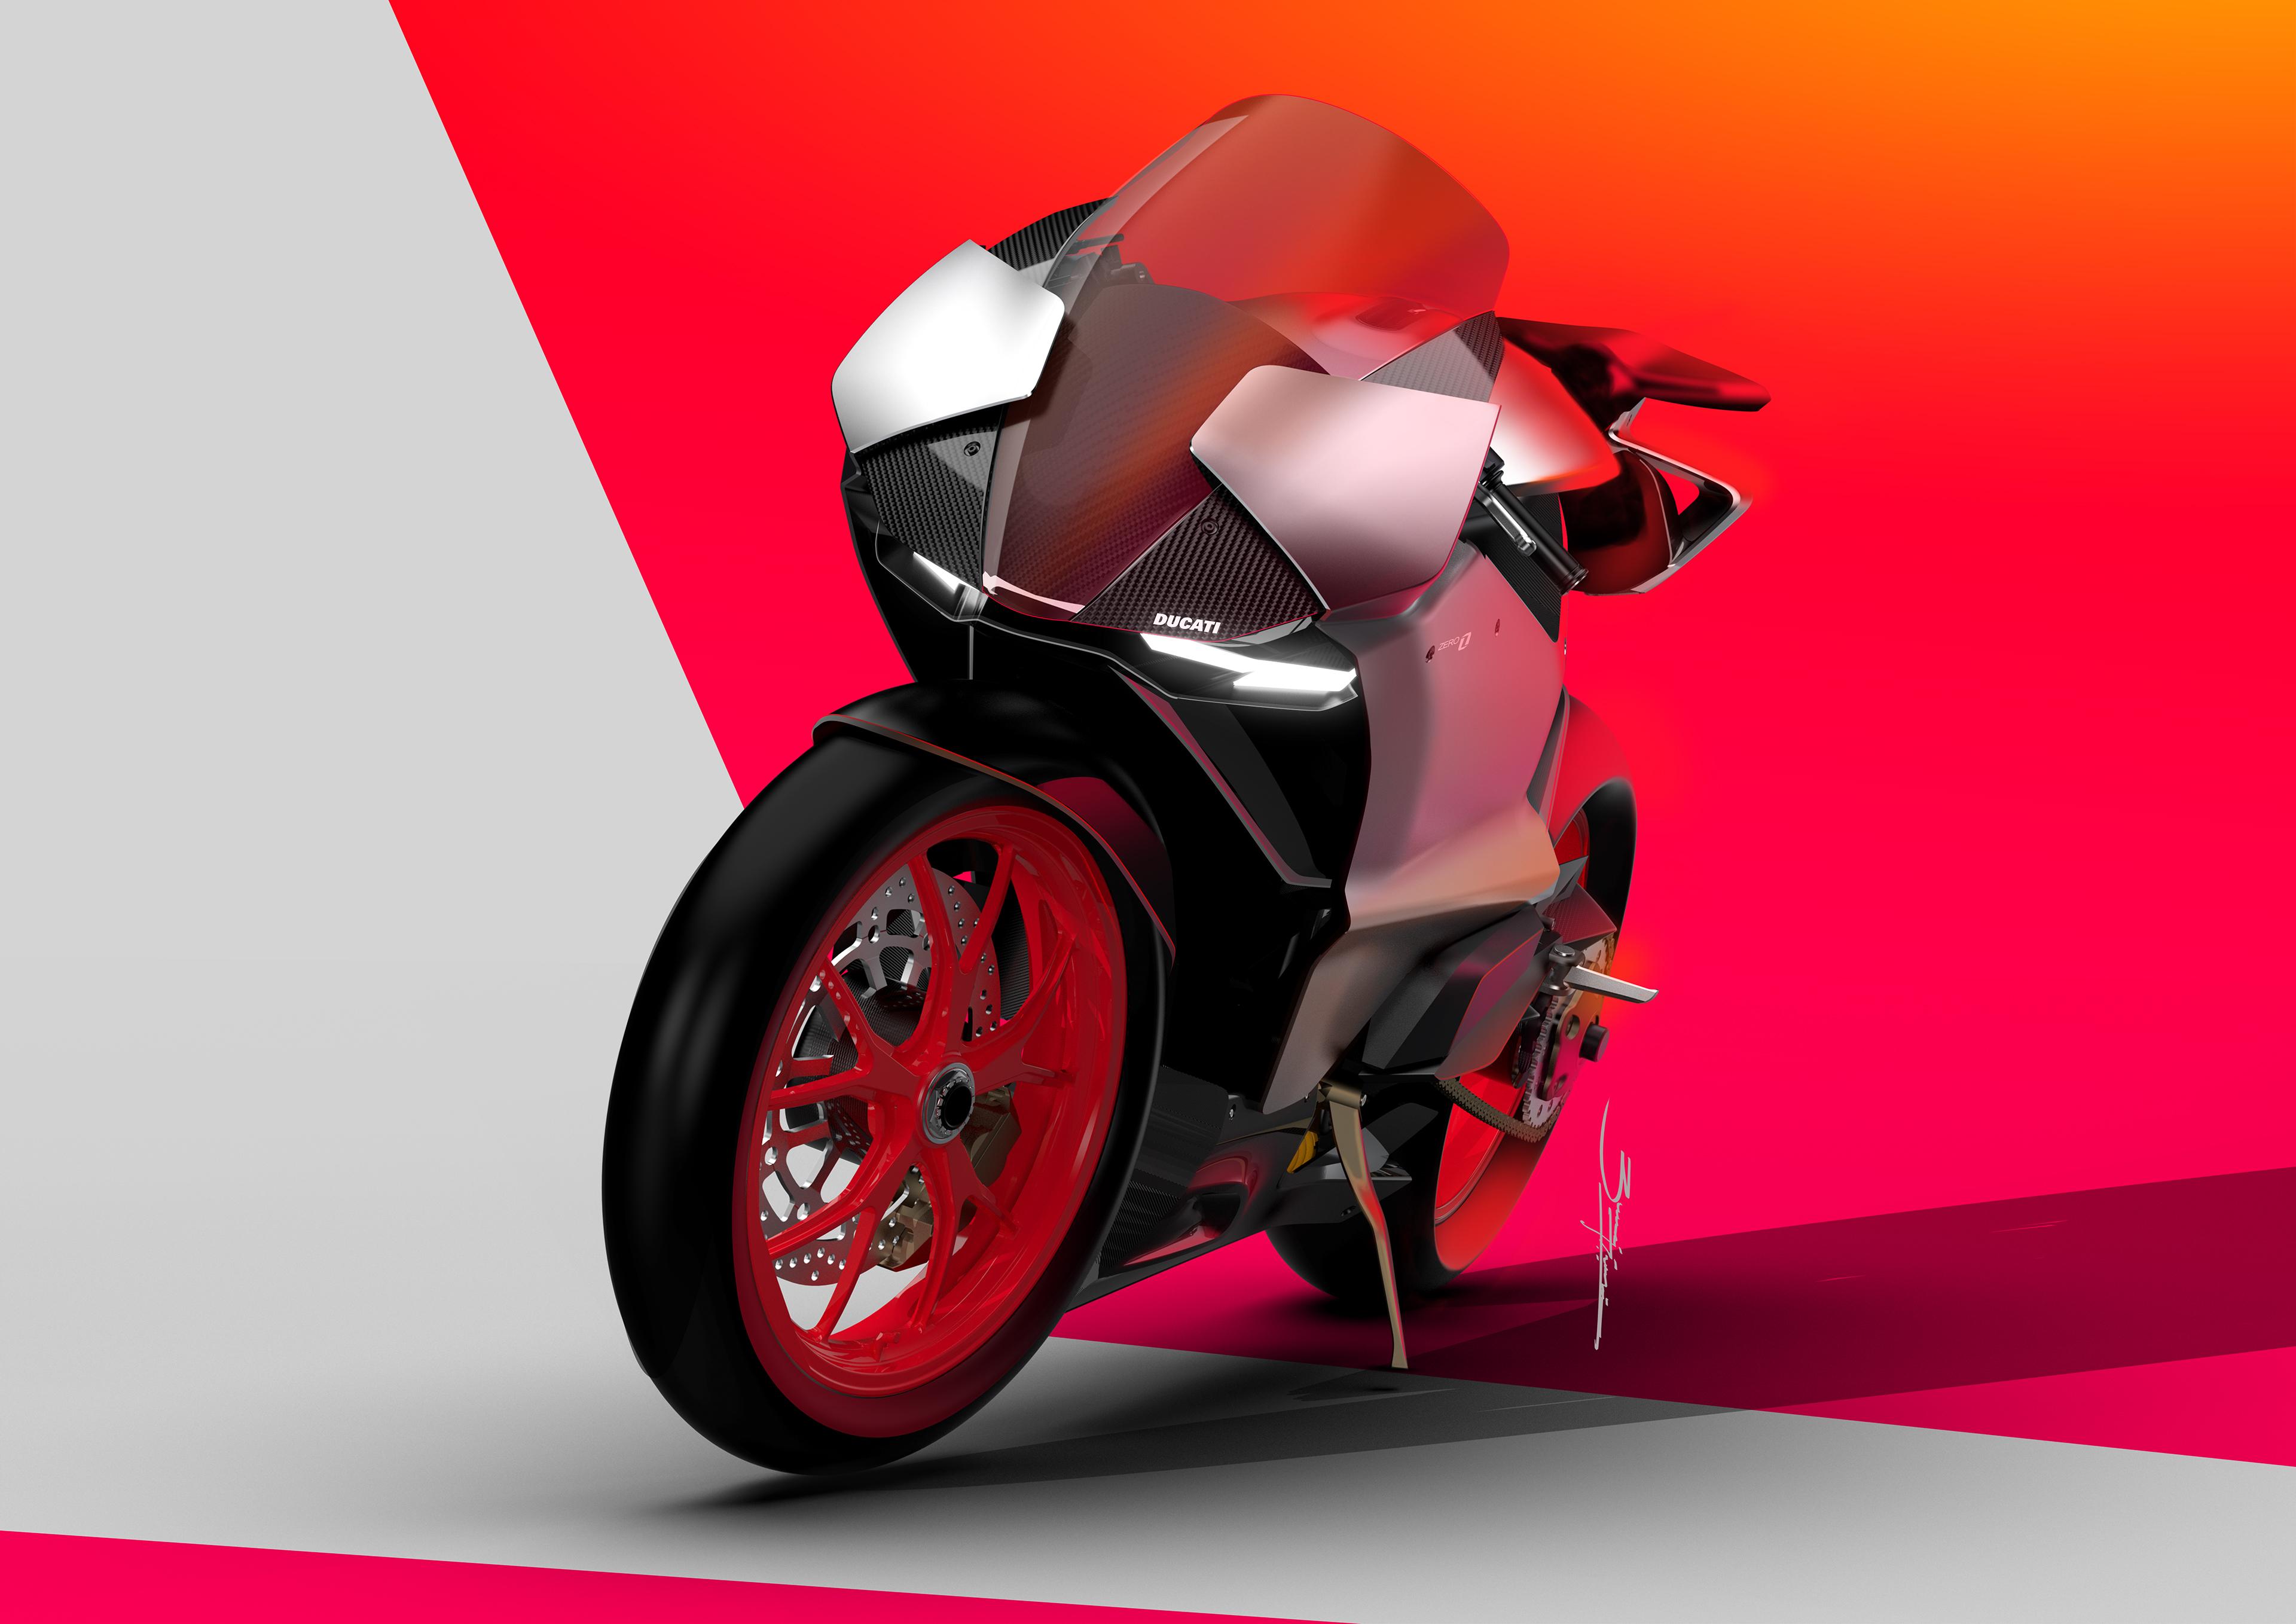 Ducati Zero Electric 2020, HD Bikes, 4k Wallpapers, Images ...